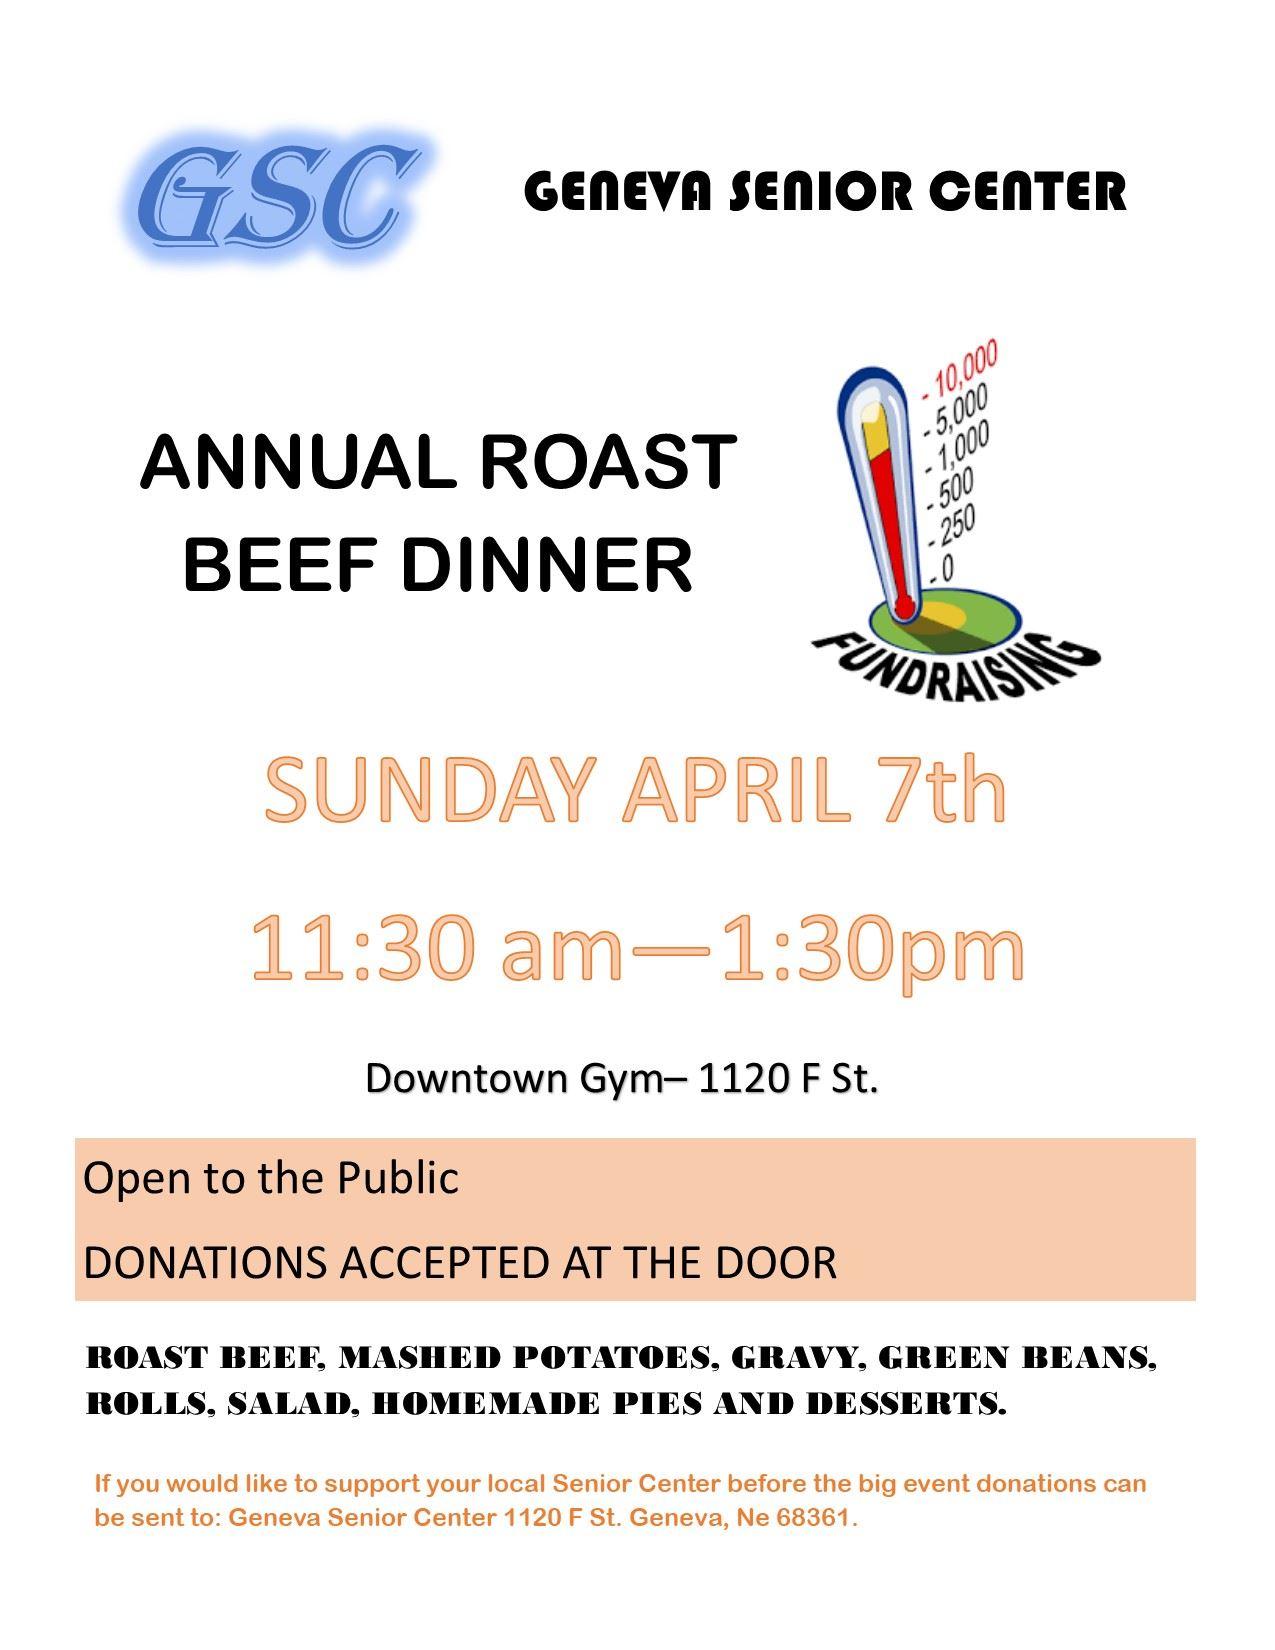 2019 roast beef fundraiser